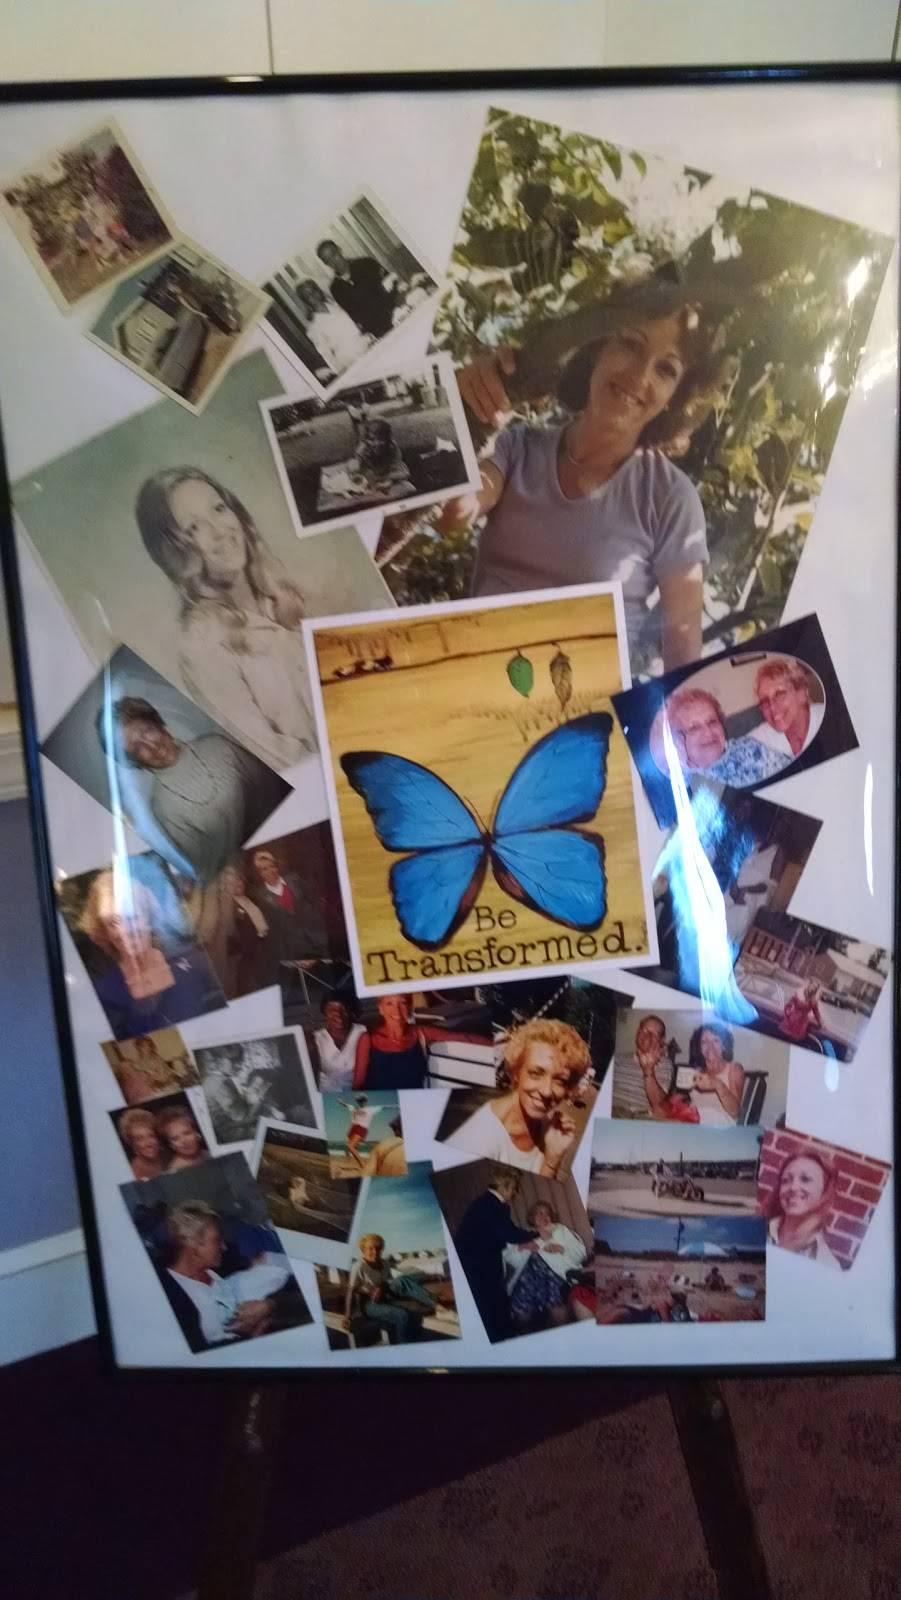 Sturtevant Funeral Home - Bennetts Creek Chapel - funeral home  | Photo 1 of 1 | Address: 2690 Bridge Rd # 17, Suffolk, VA 23435, USA | Phone: (757) 483-4392